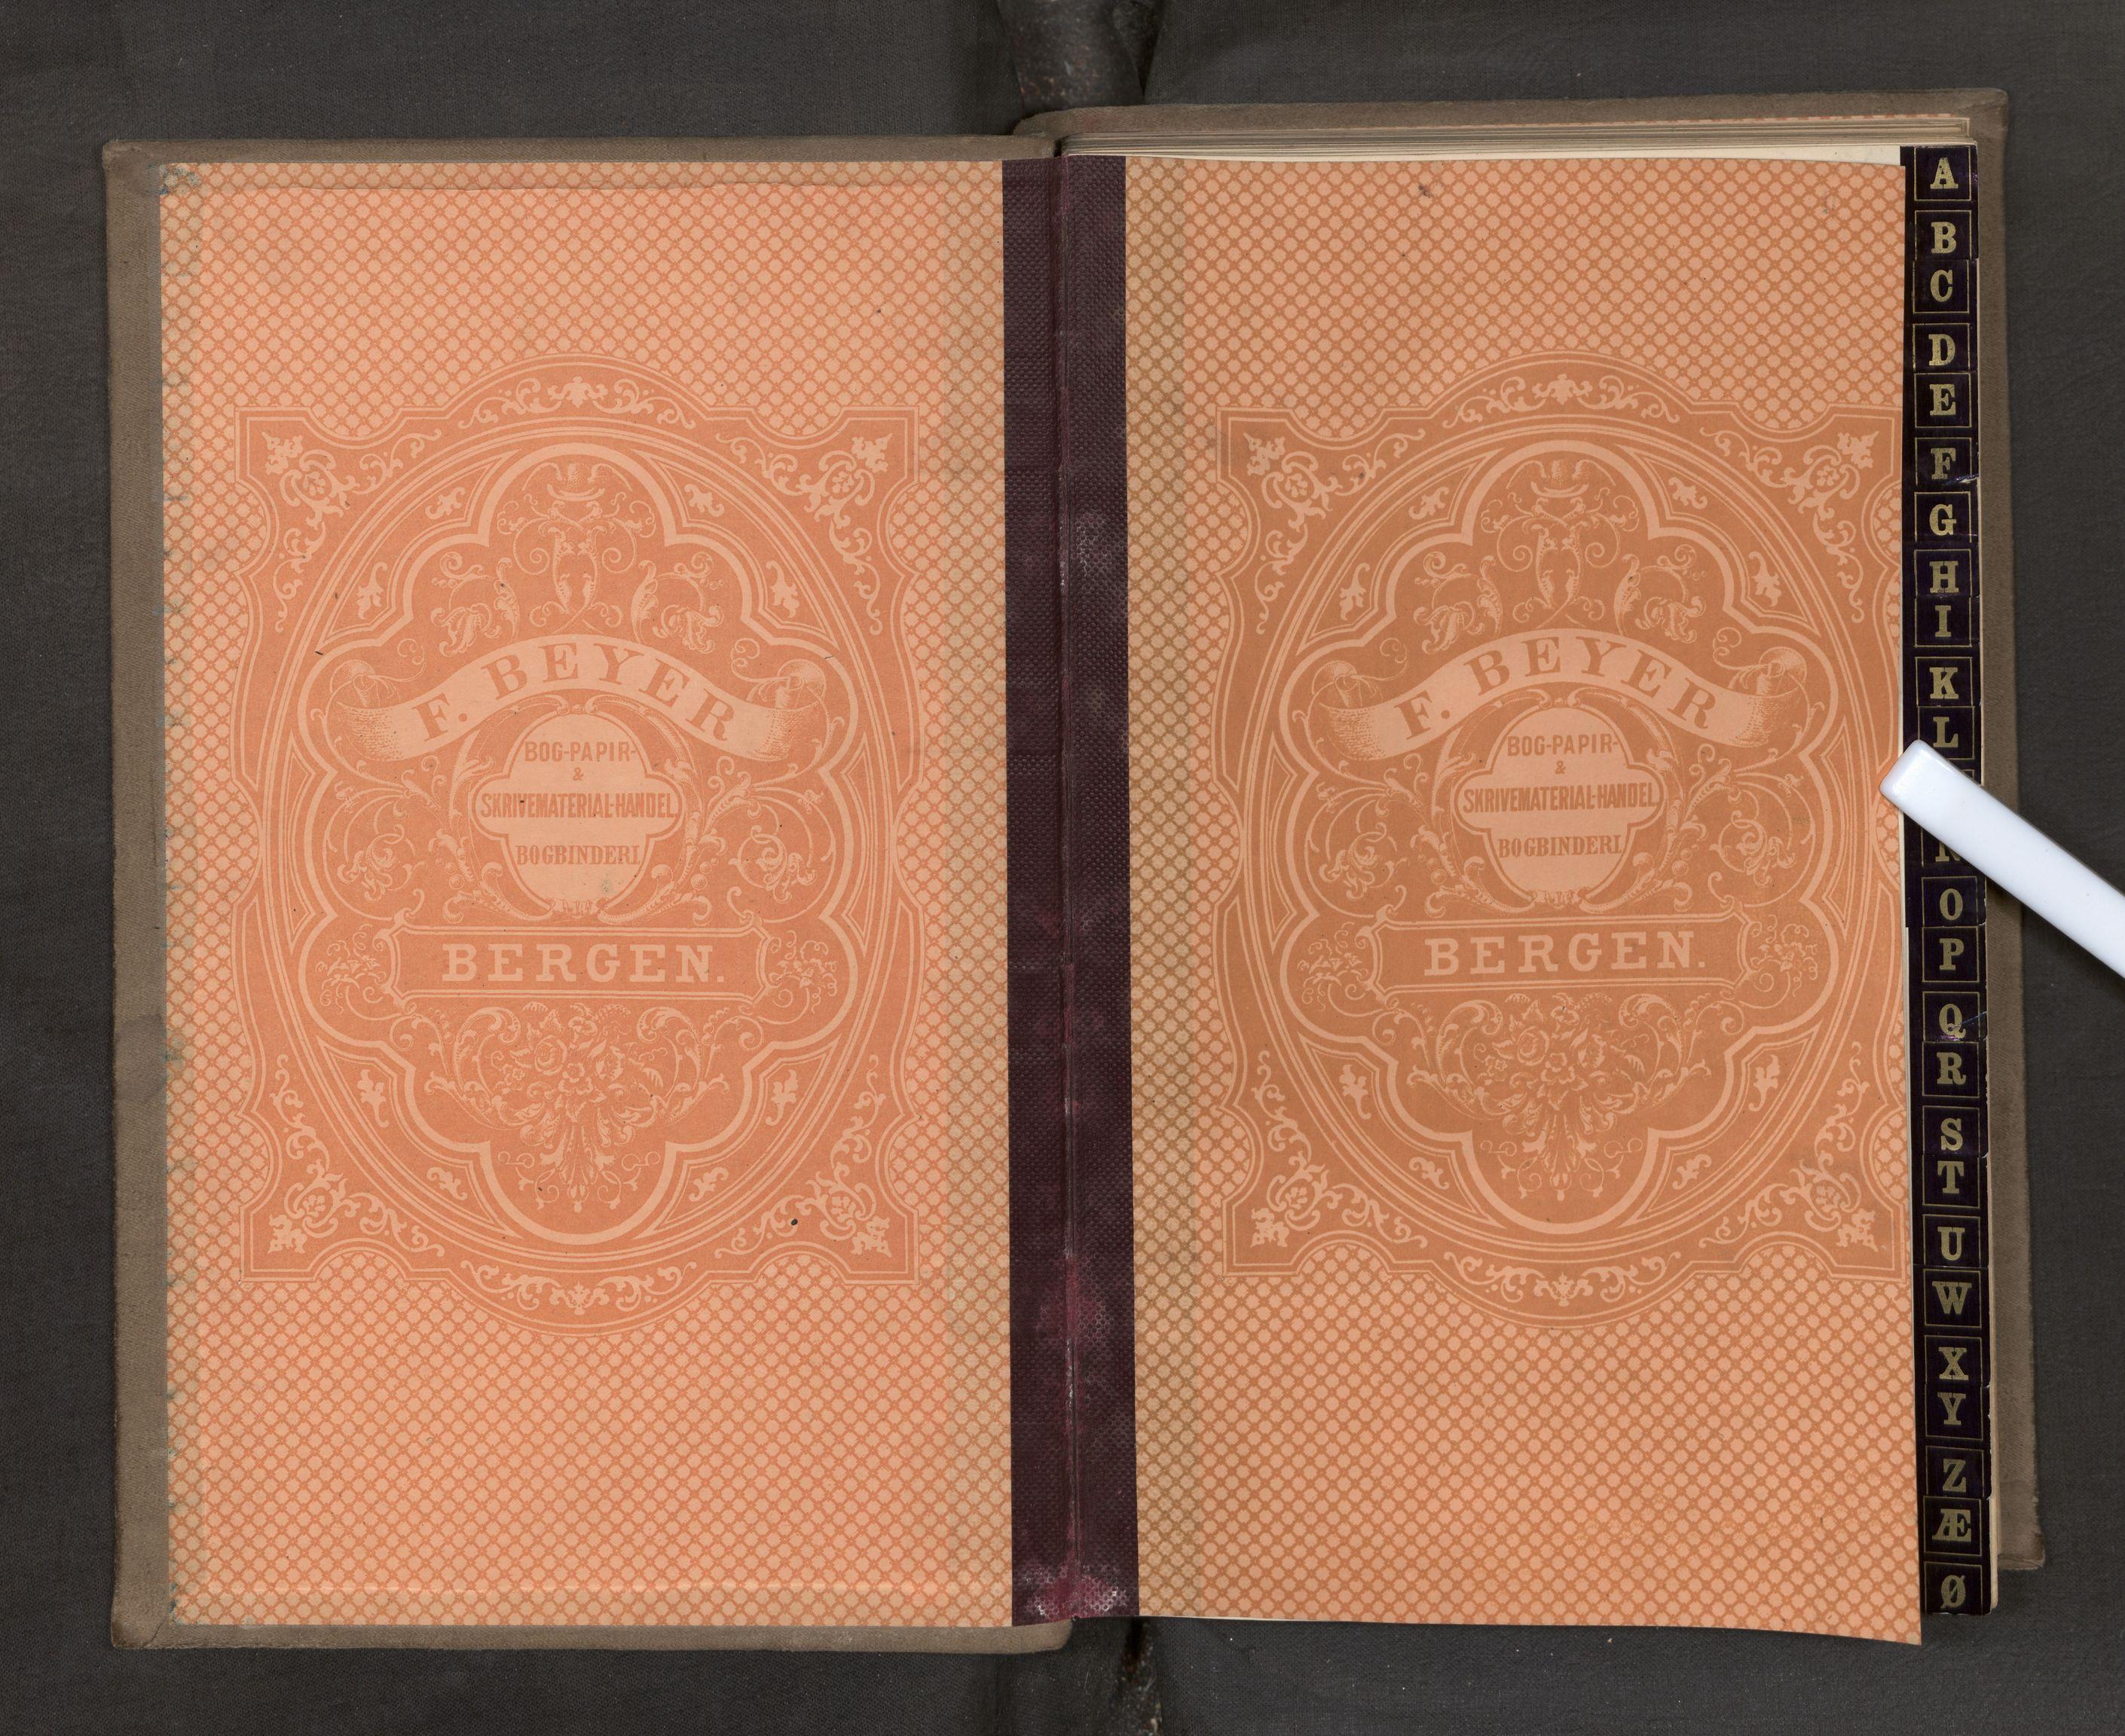 SAB, Jondal Skipsassuranseforening, E/L0024: Kontobok 1, 1869-1977